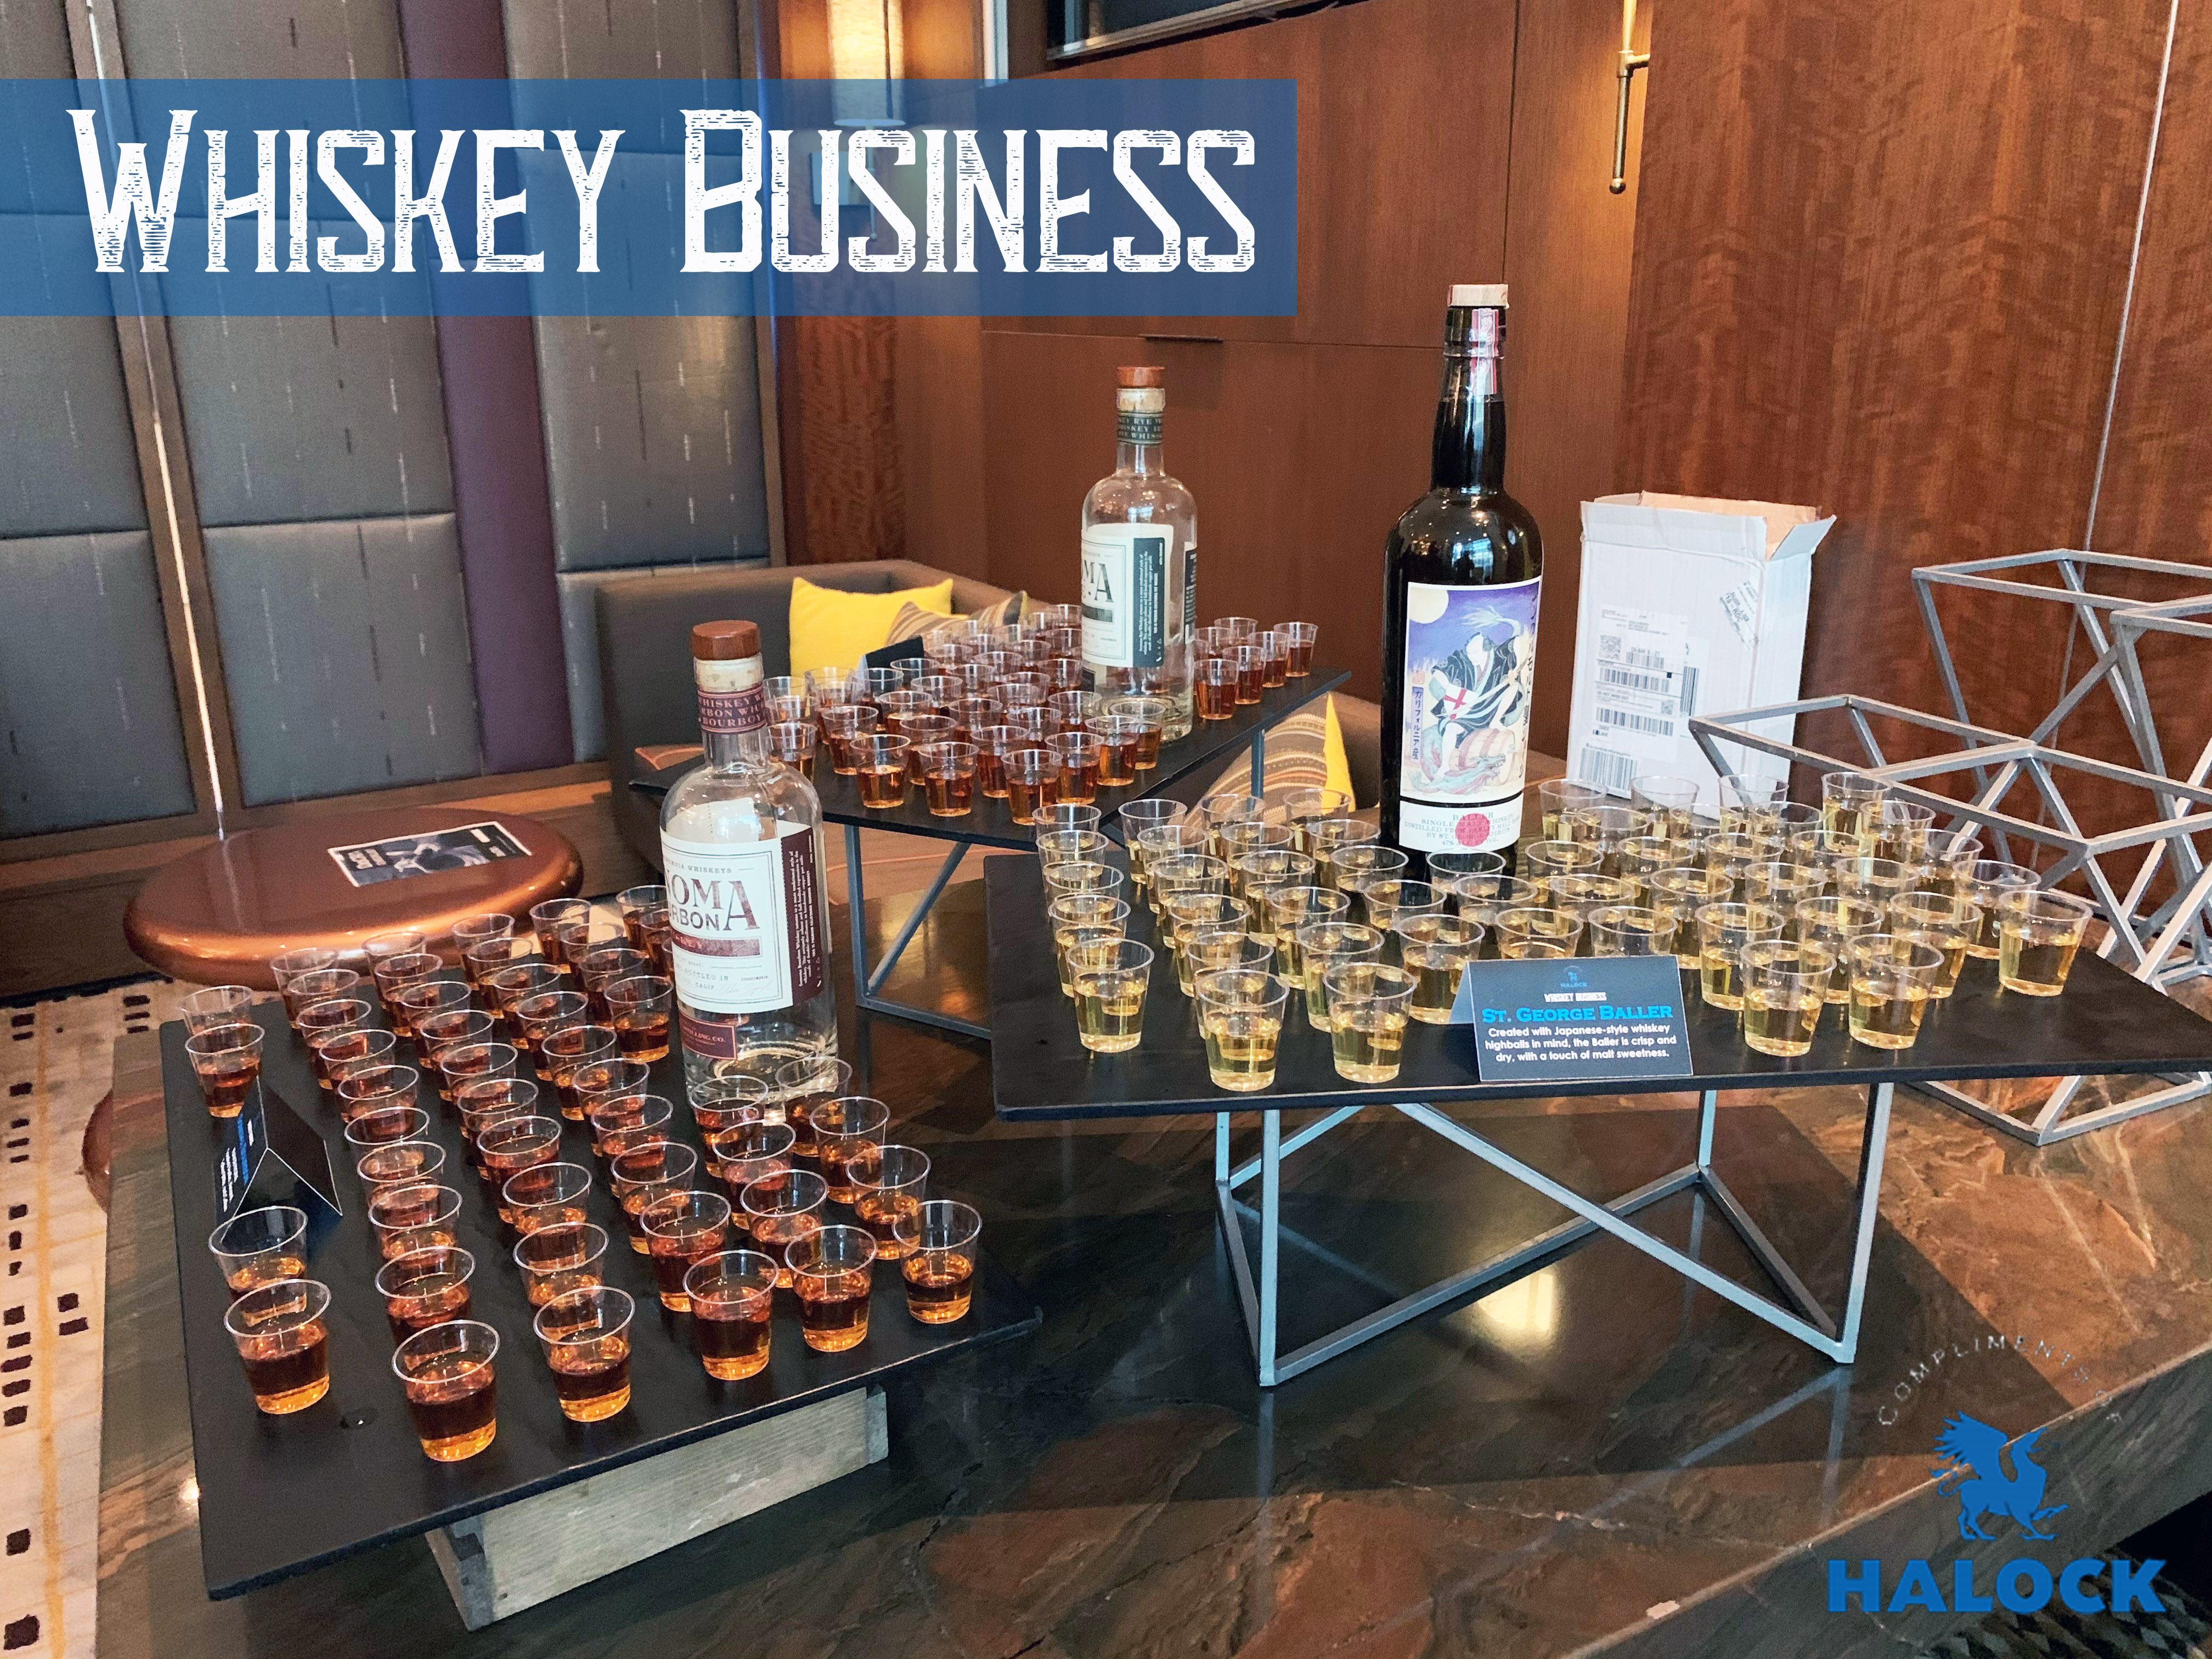 Bottles HALOCK Whiskey Business at RSA